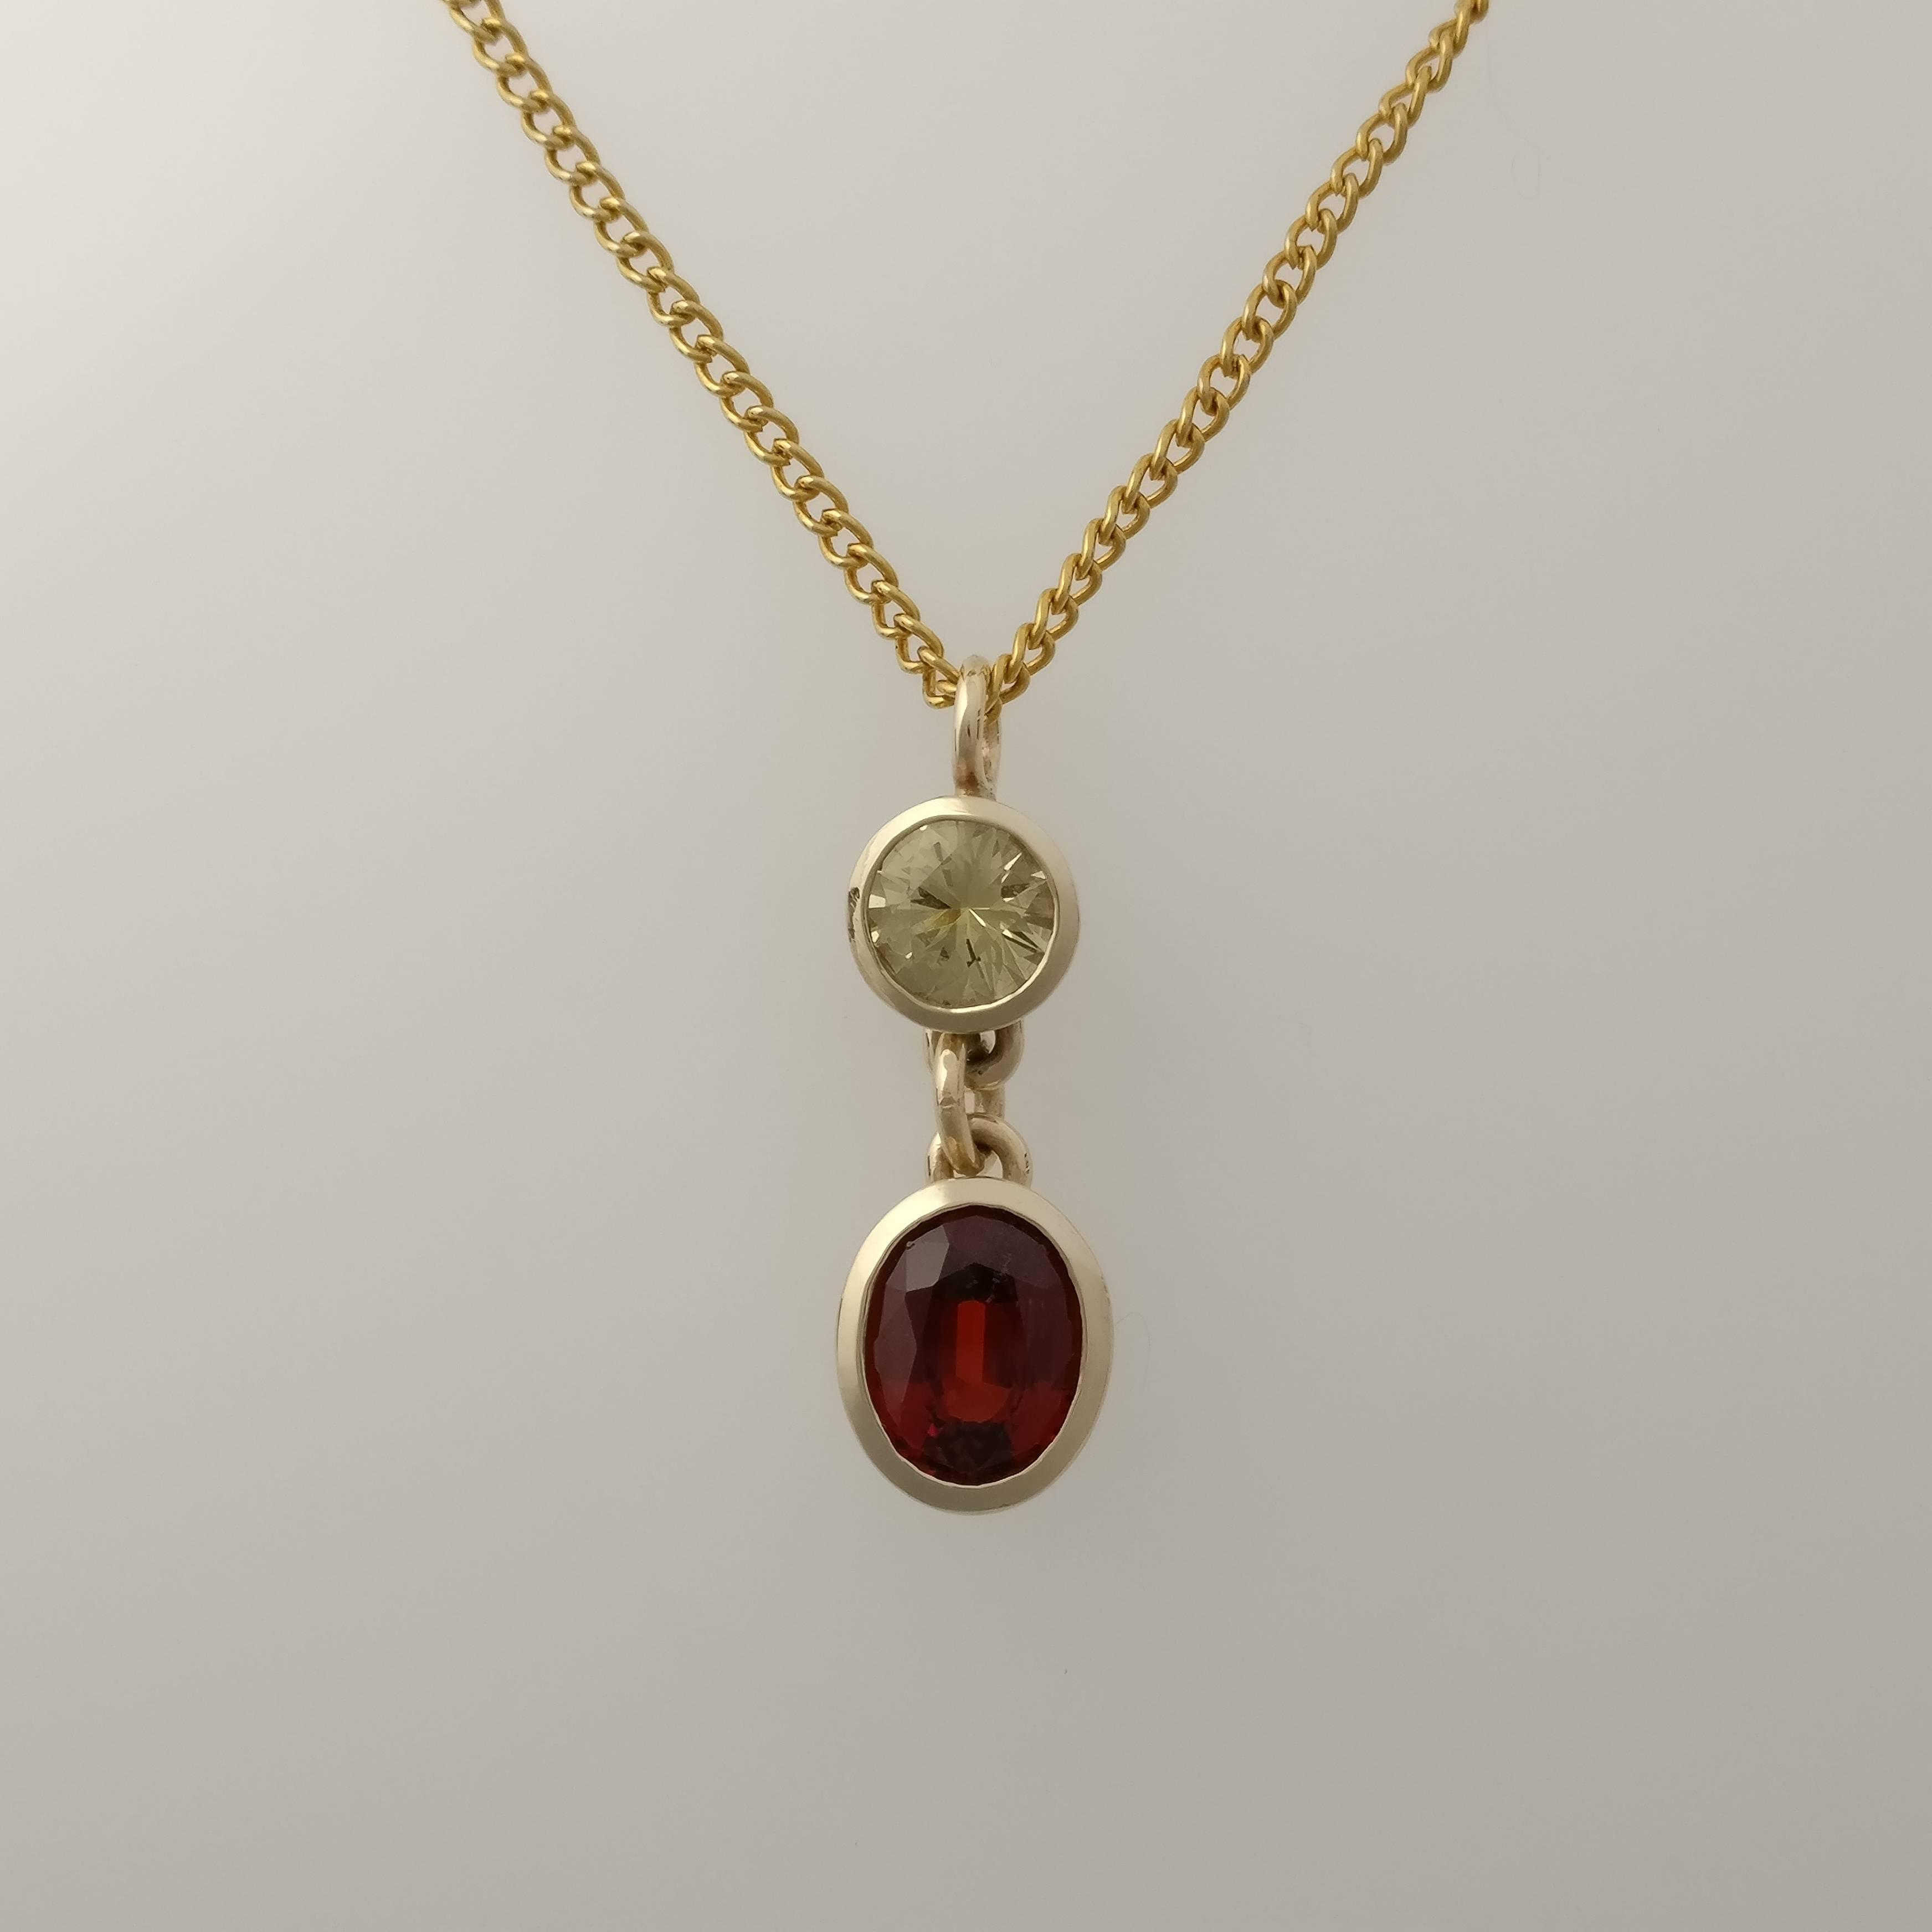 Yellow gold and garnet pendant